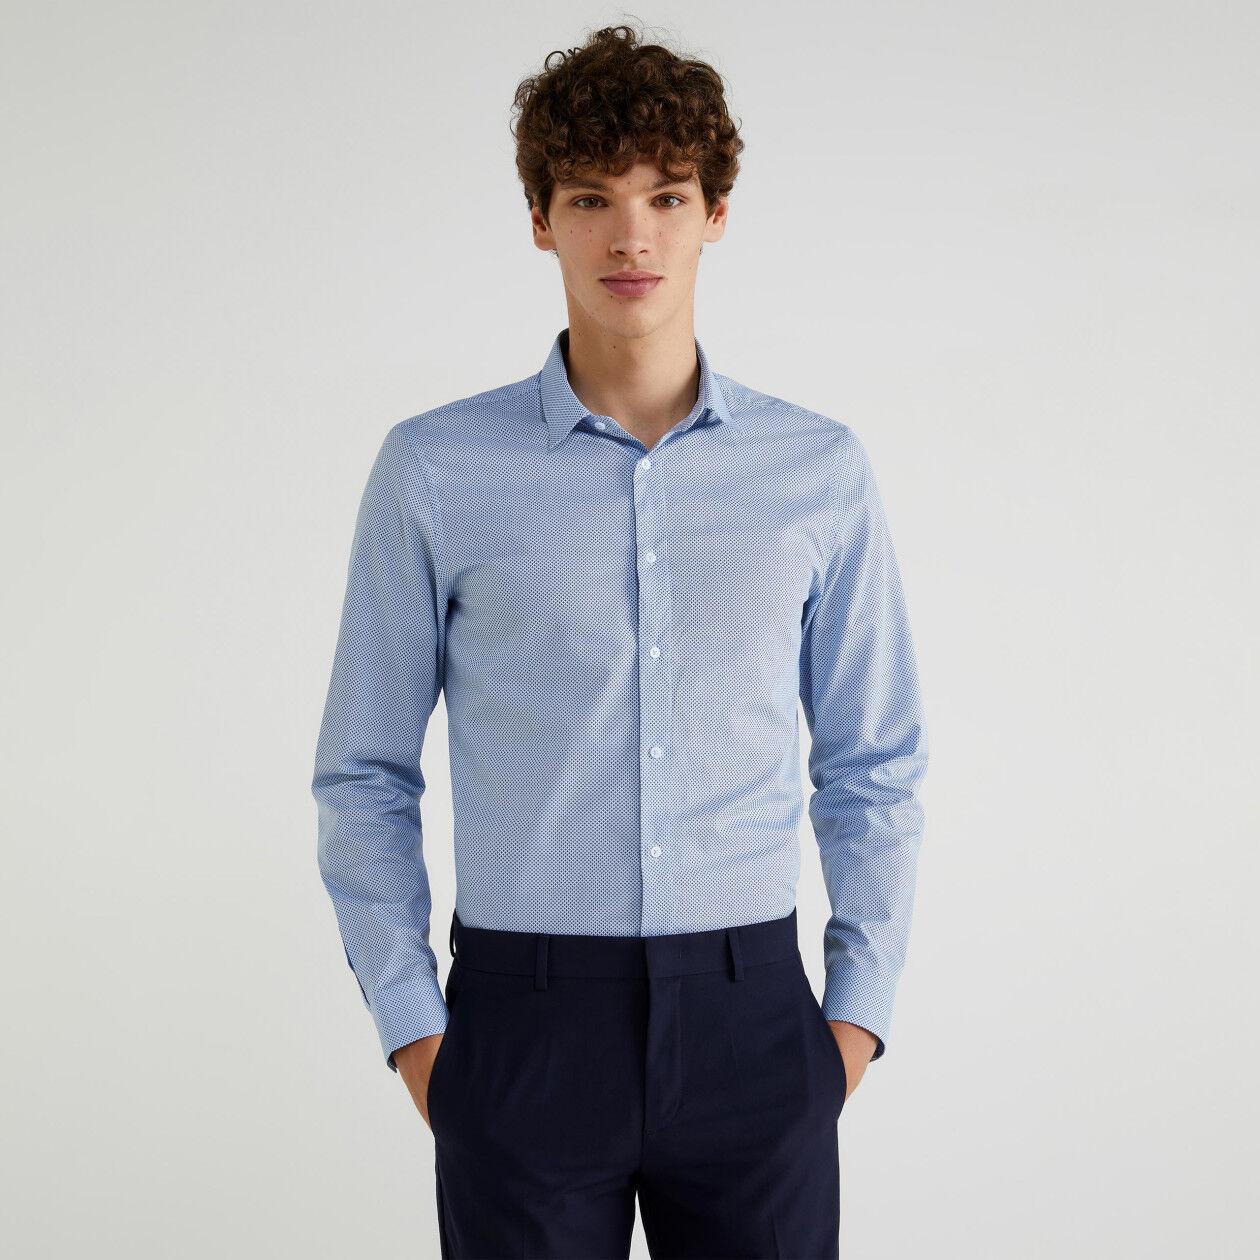 Oxfordhemd mit Print